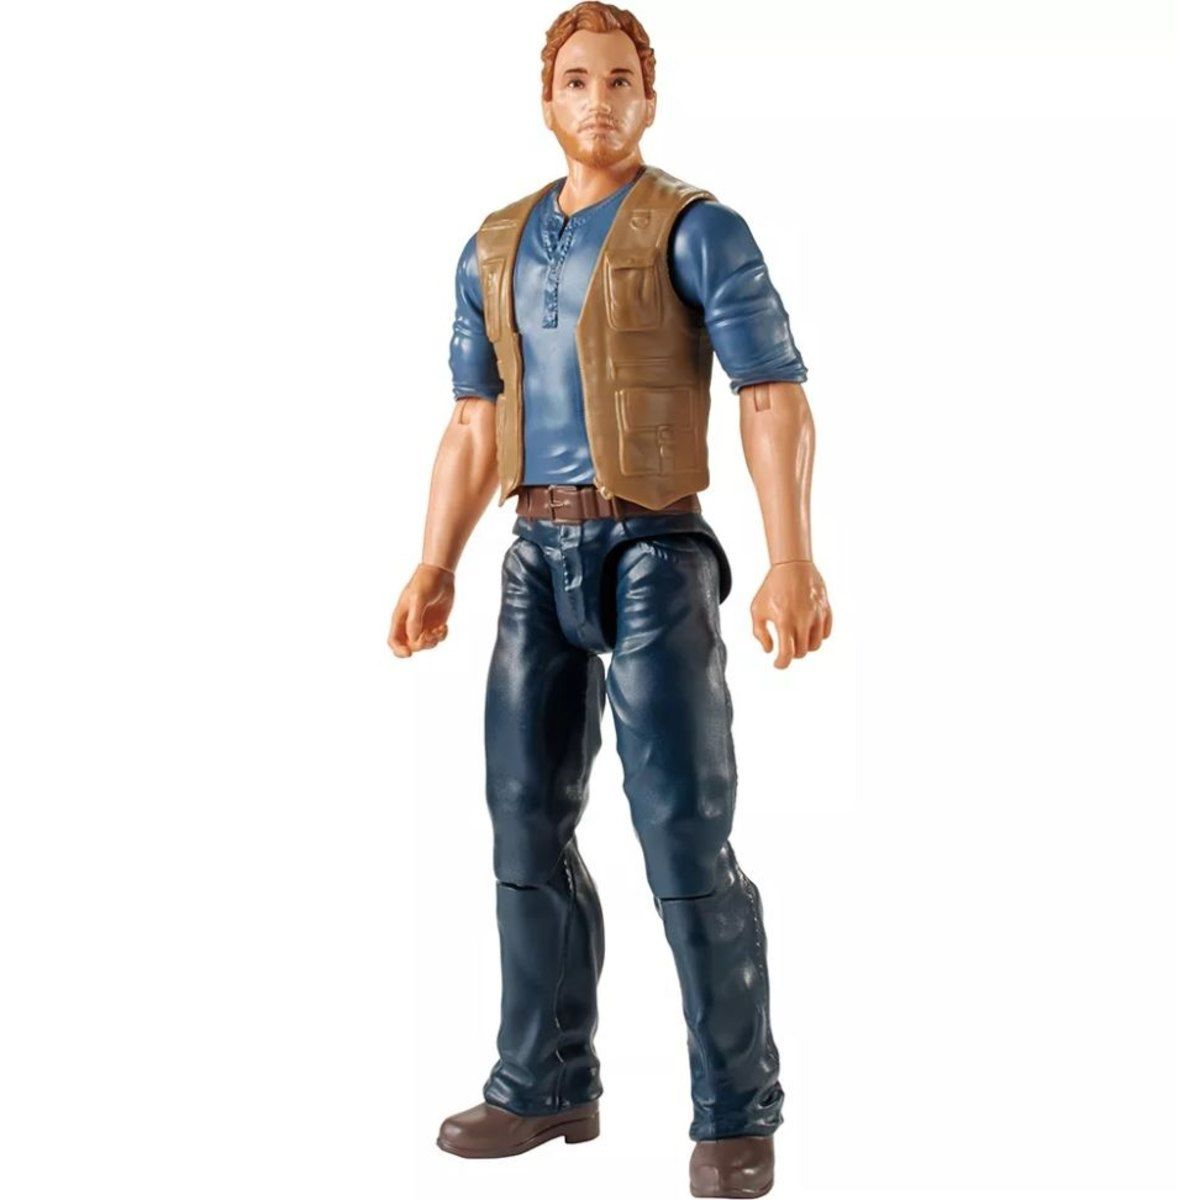 Boneco Owen: Jurassic World - Mattel